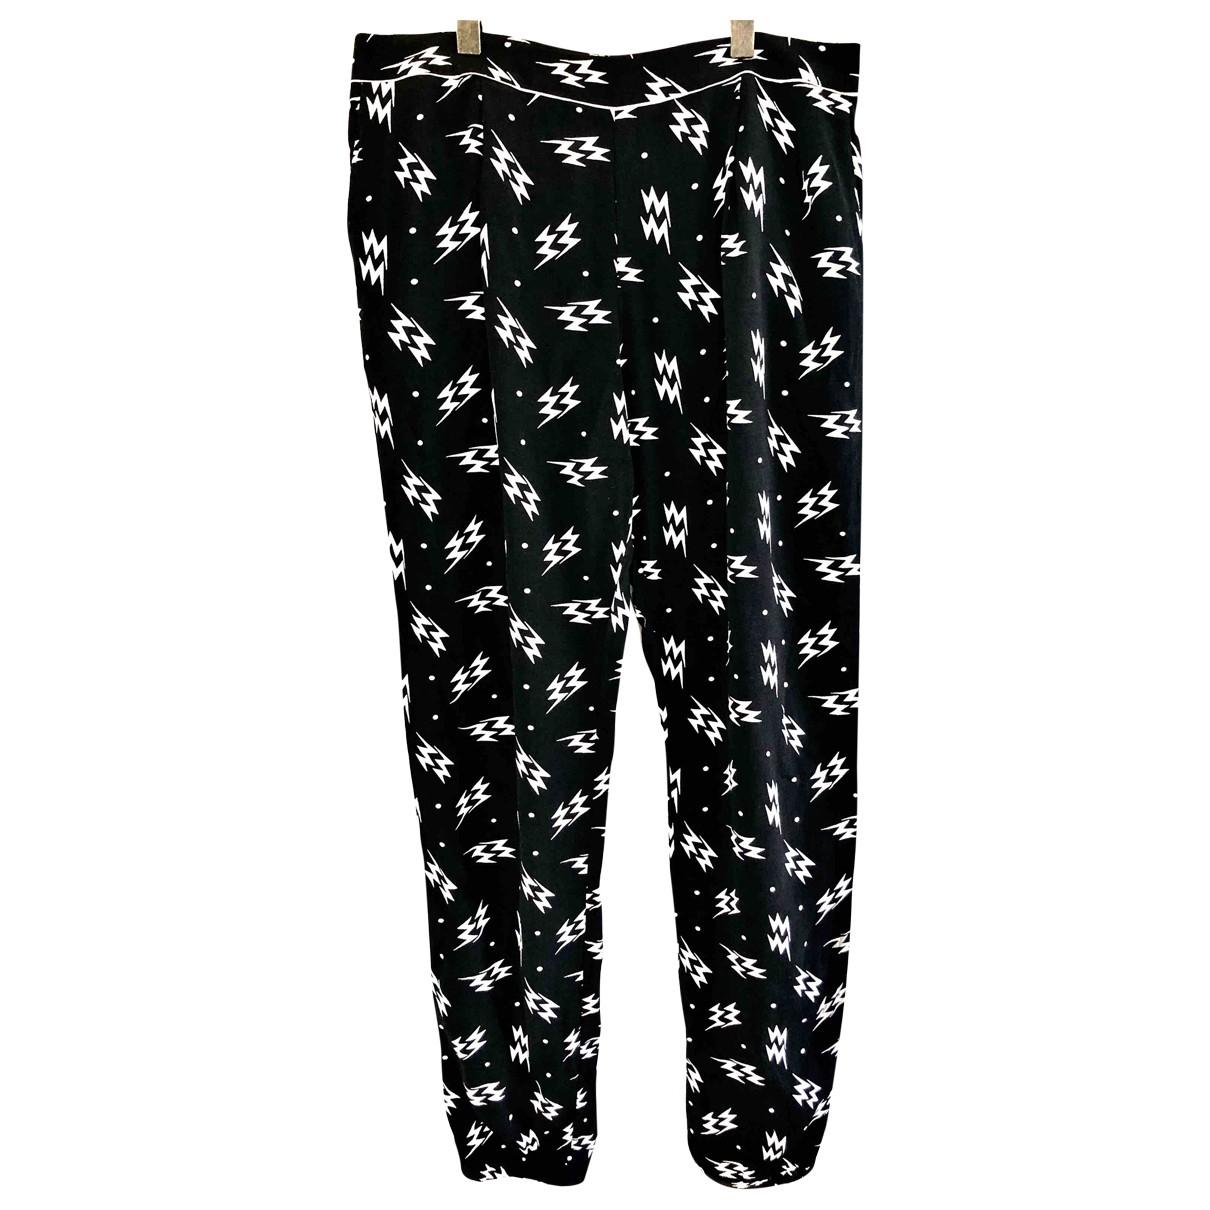 Claudie Pierlot \N Black Trousers for Women 36 FR